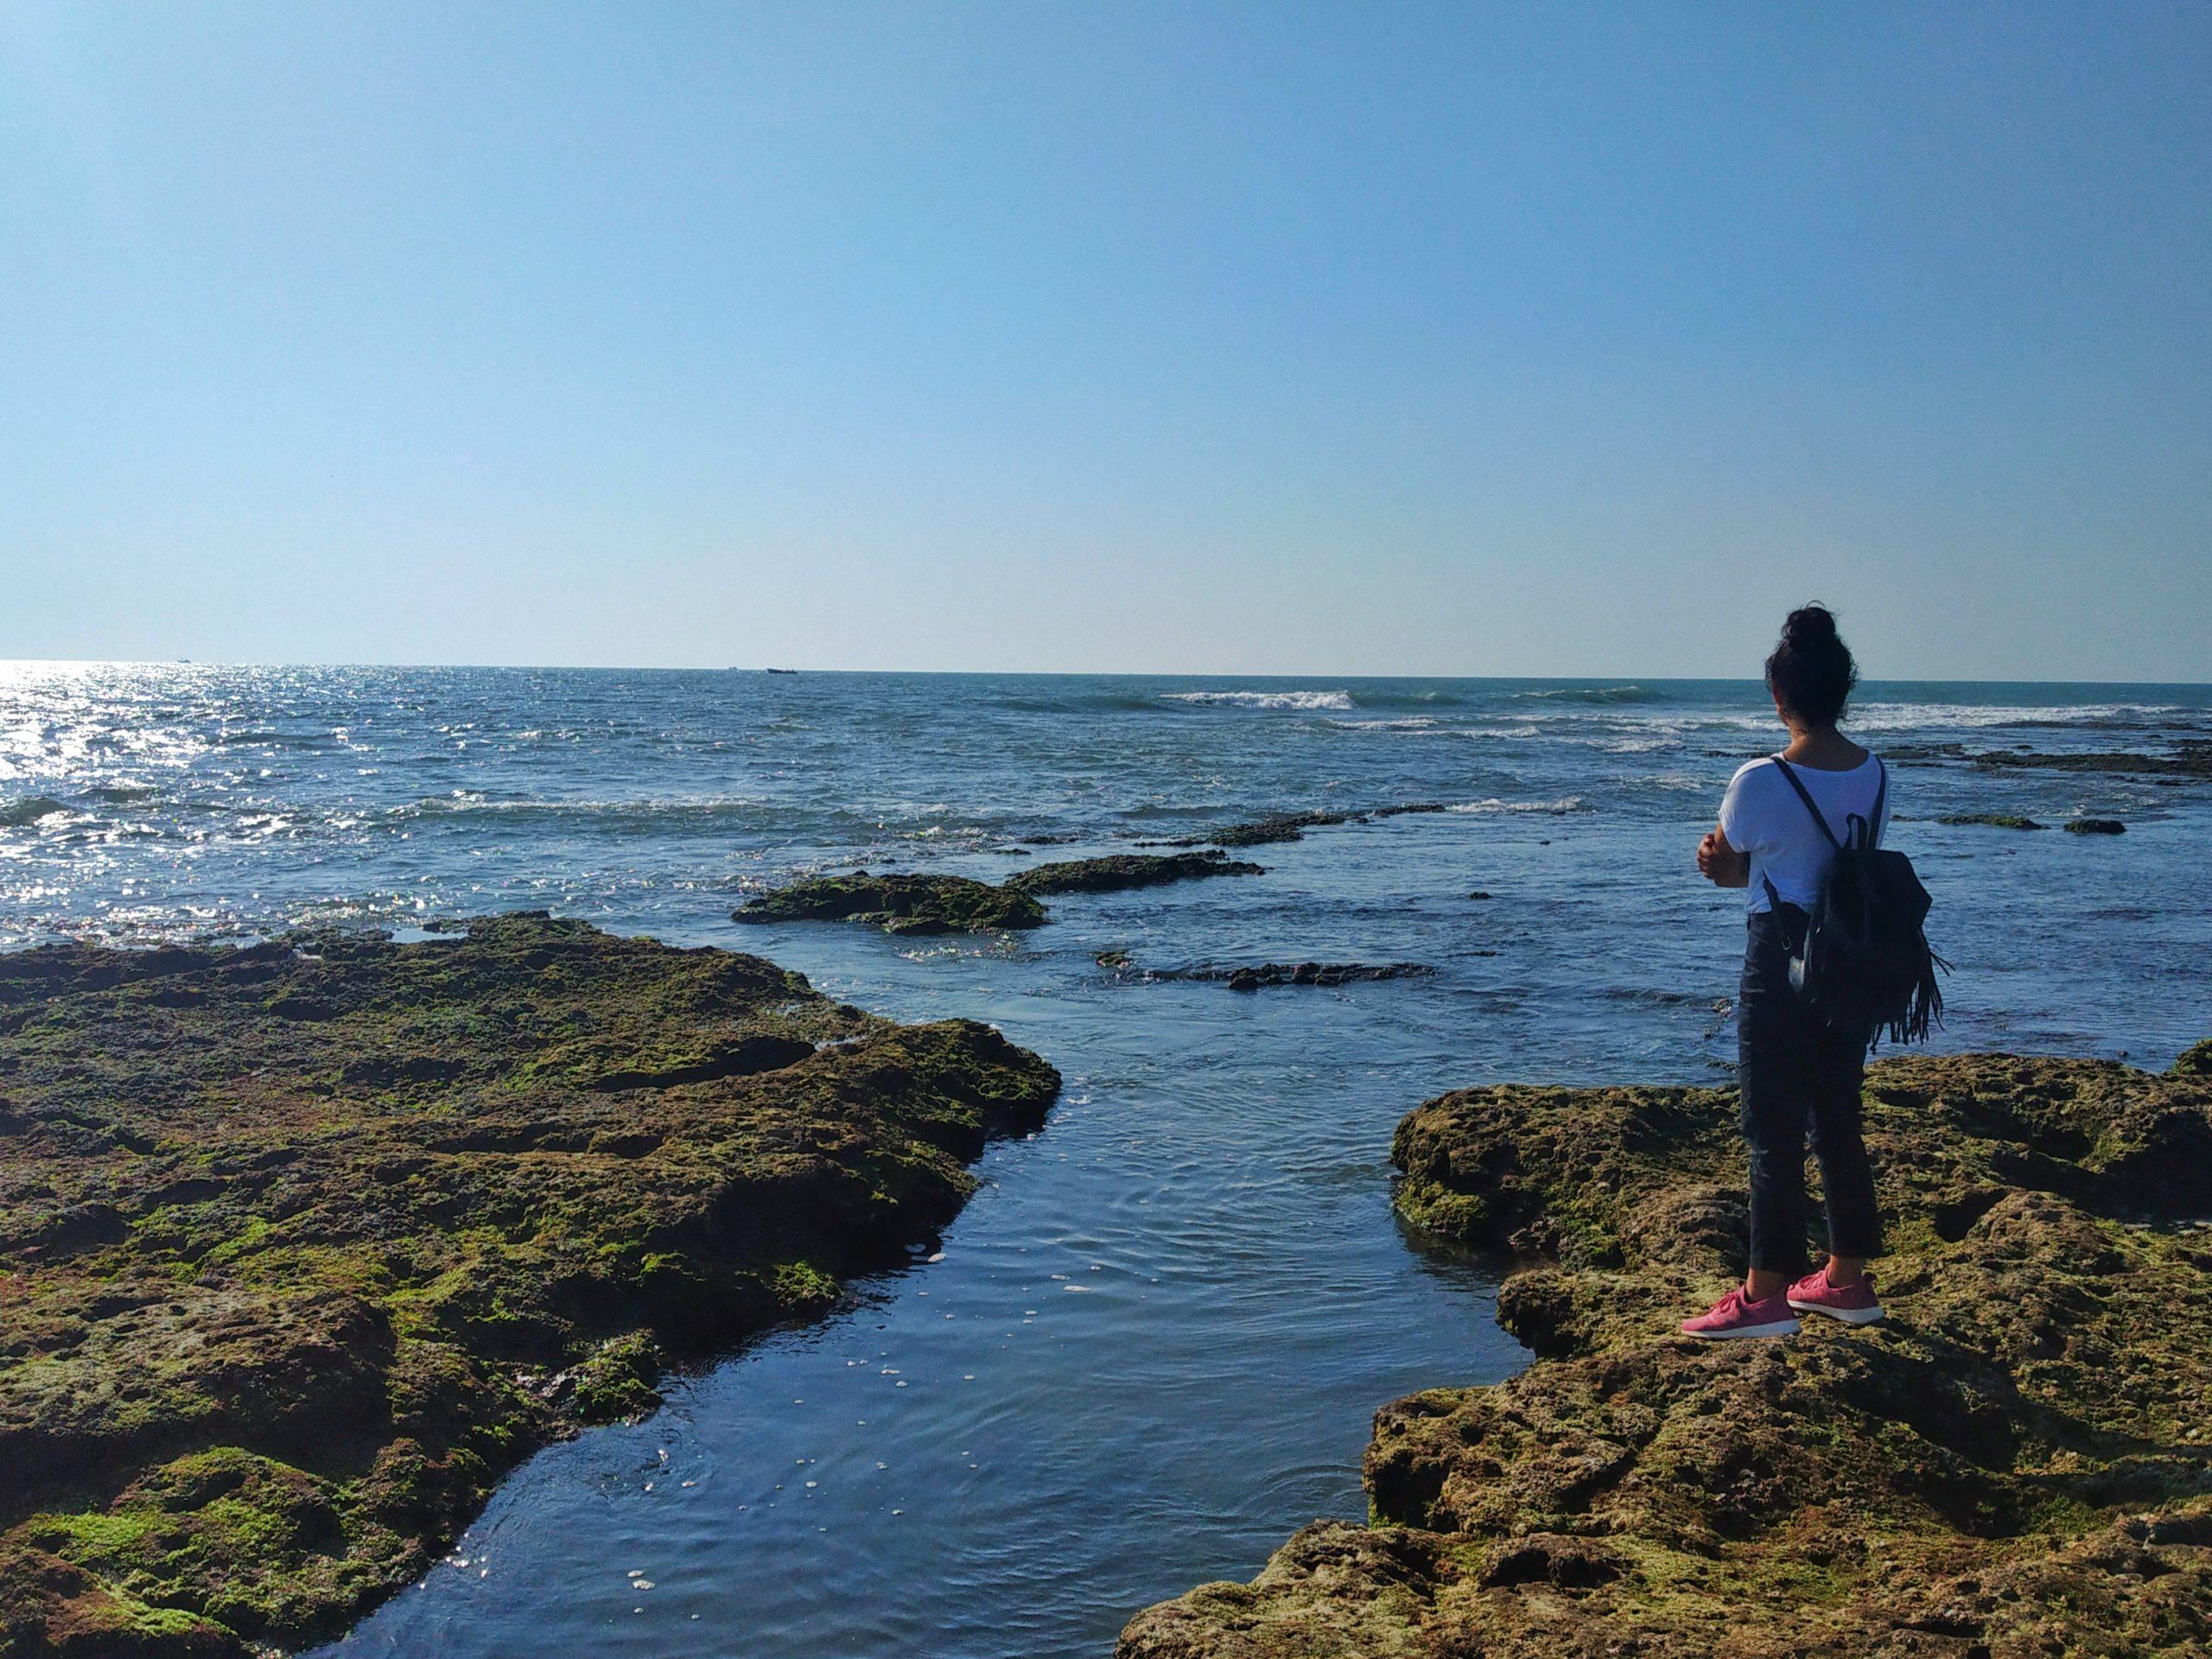 Viewing Sea Scenery